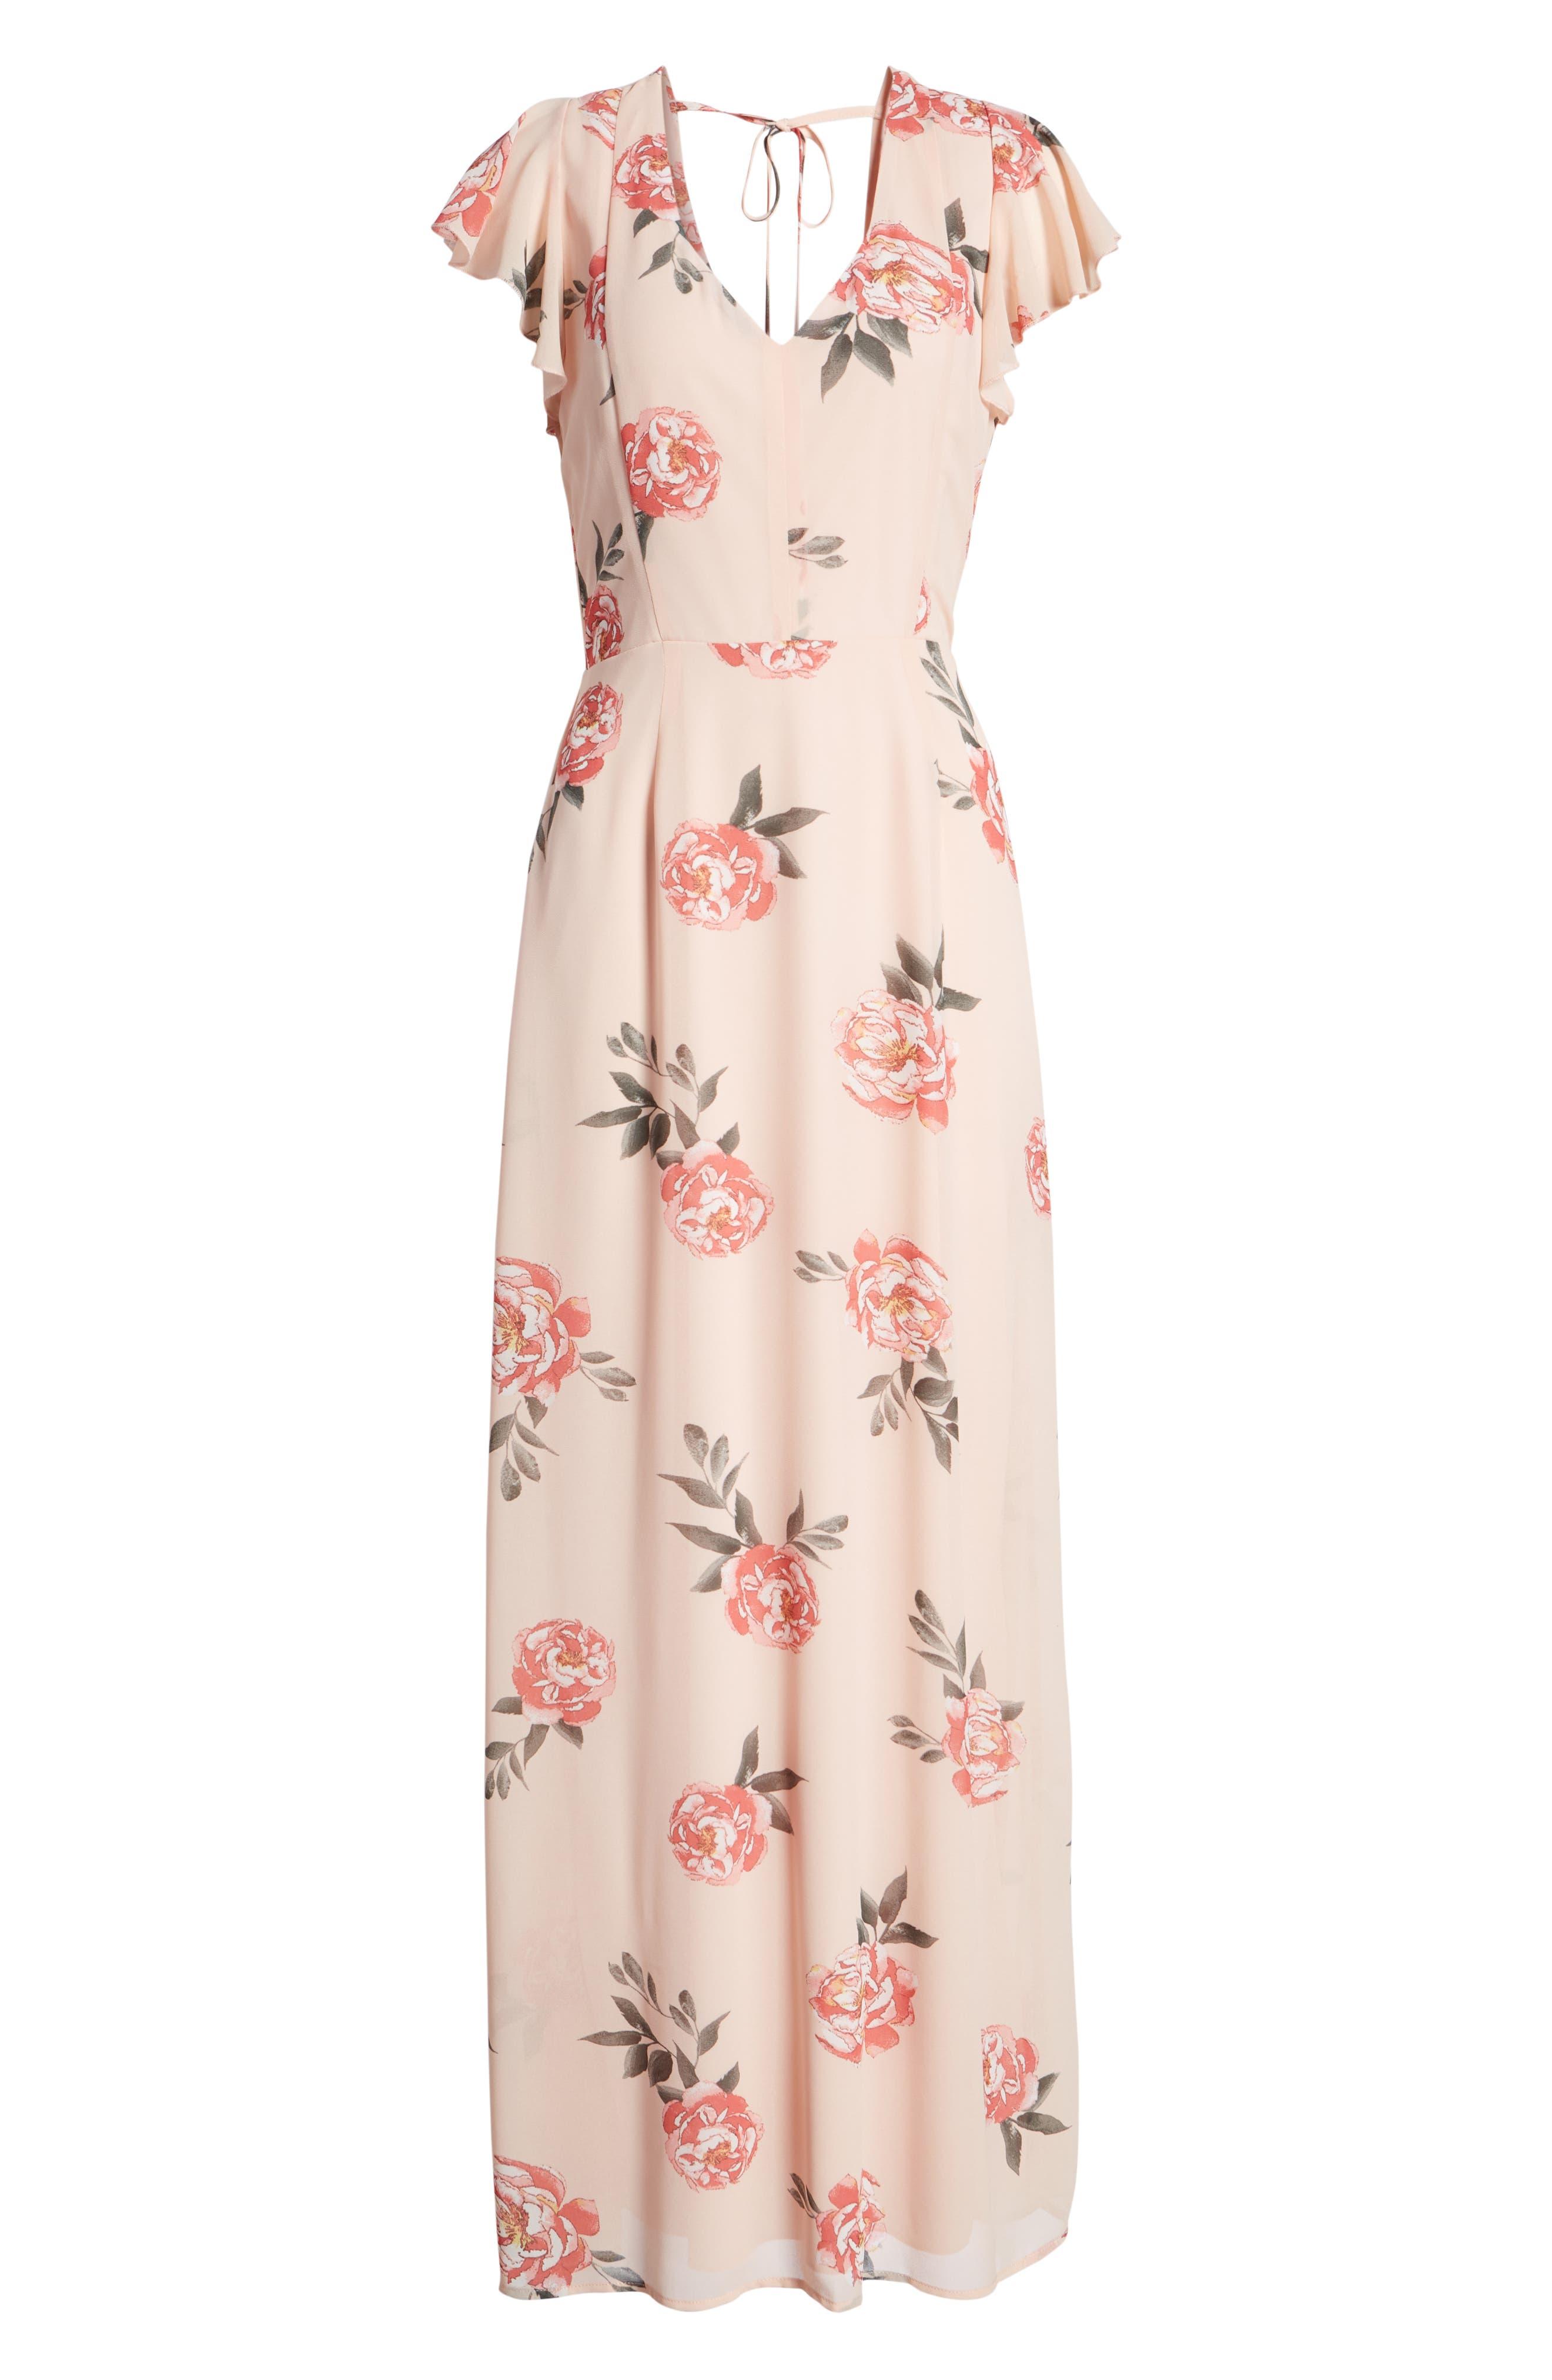 Floral Maxi Dress,                             Alternate thumbnail 7, color,                             LIGHT PEACH